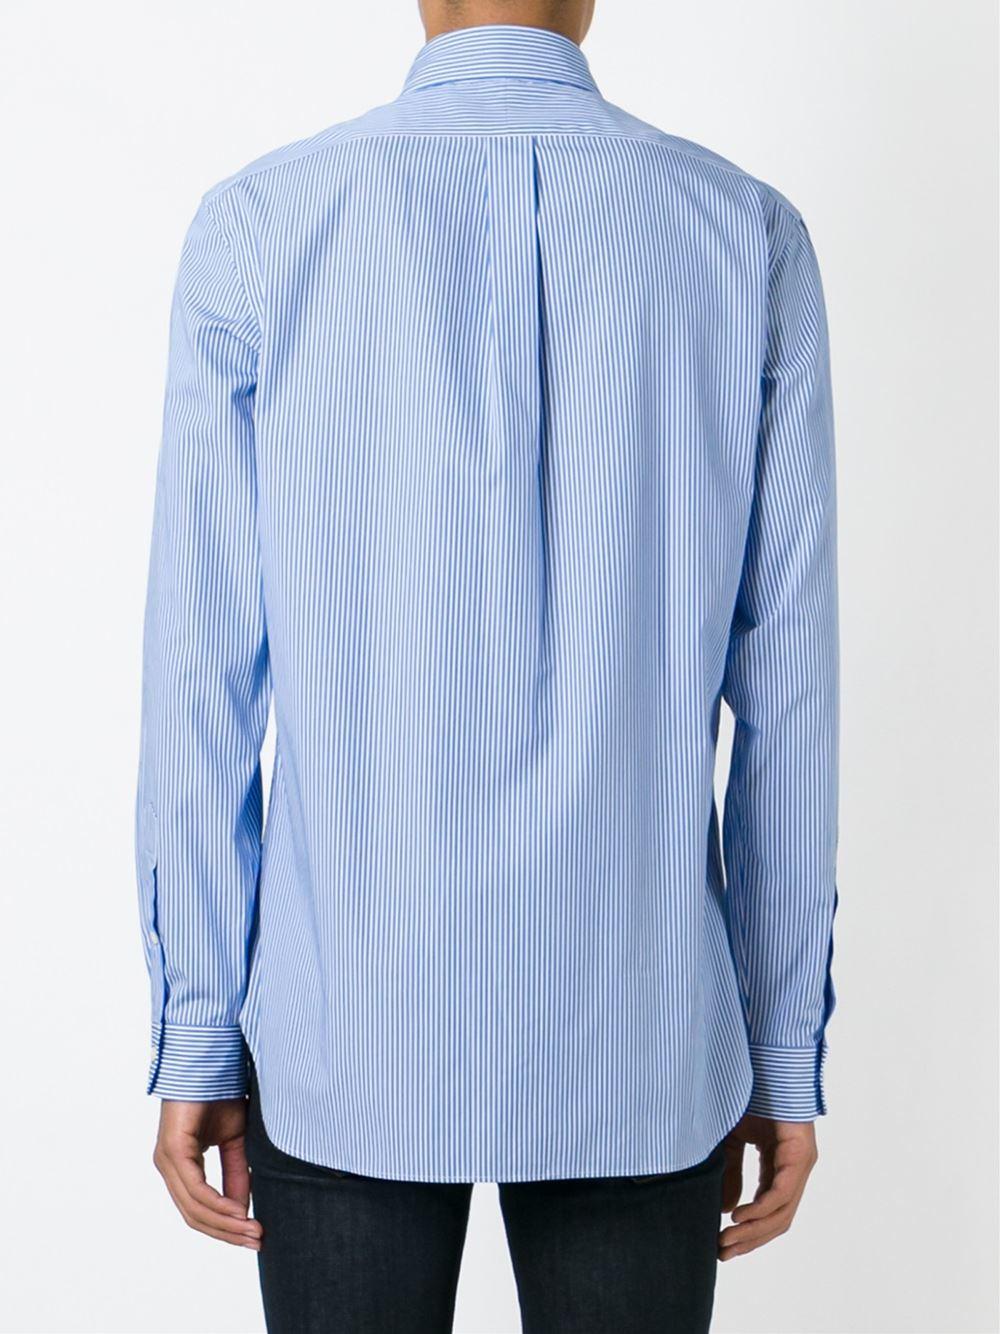 Polo ralph lauren classic embossed logo shirt in blue for for Ralph lauren logo shirt